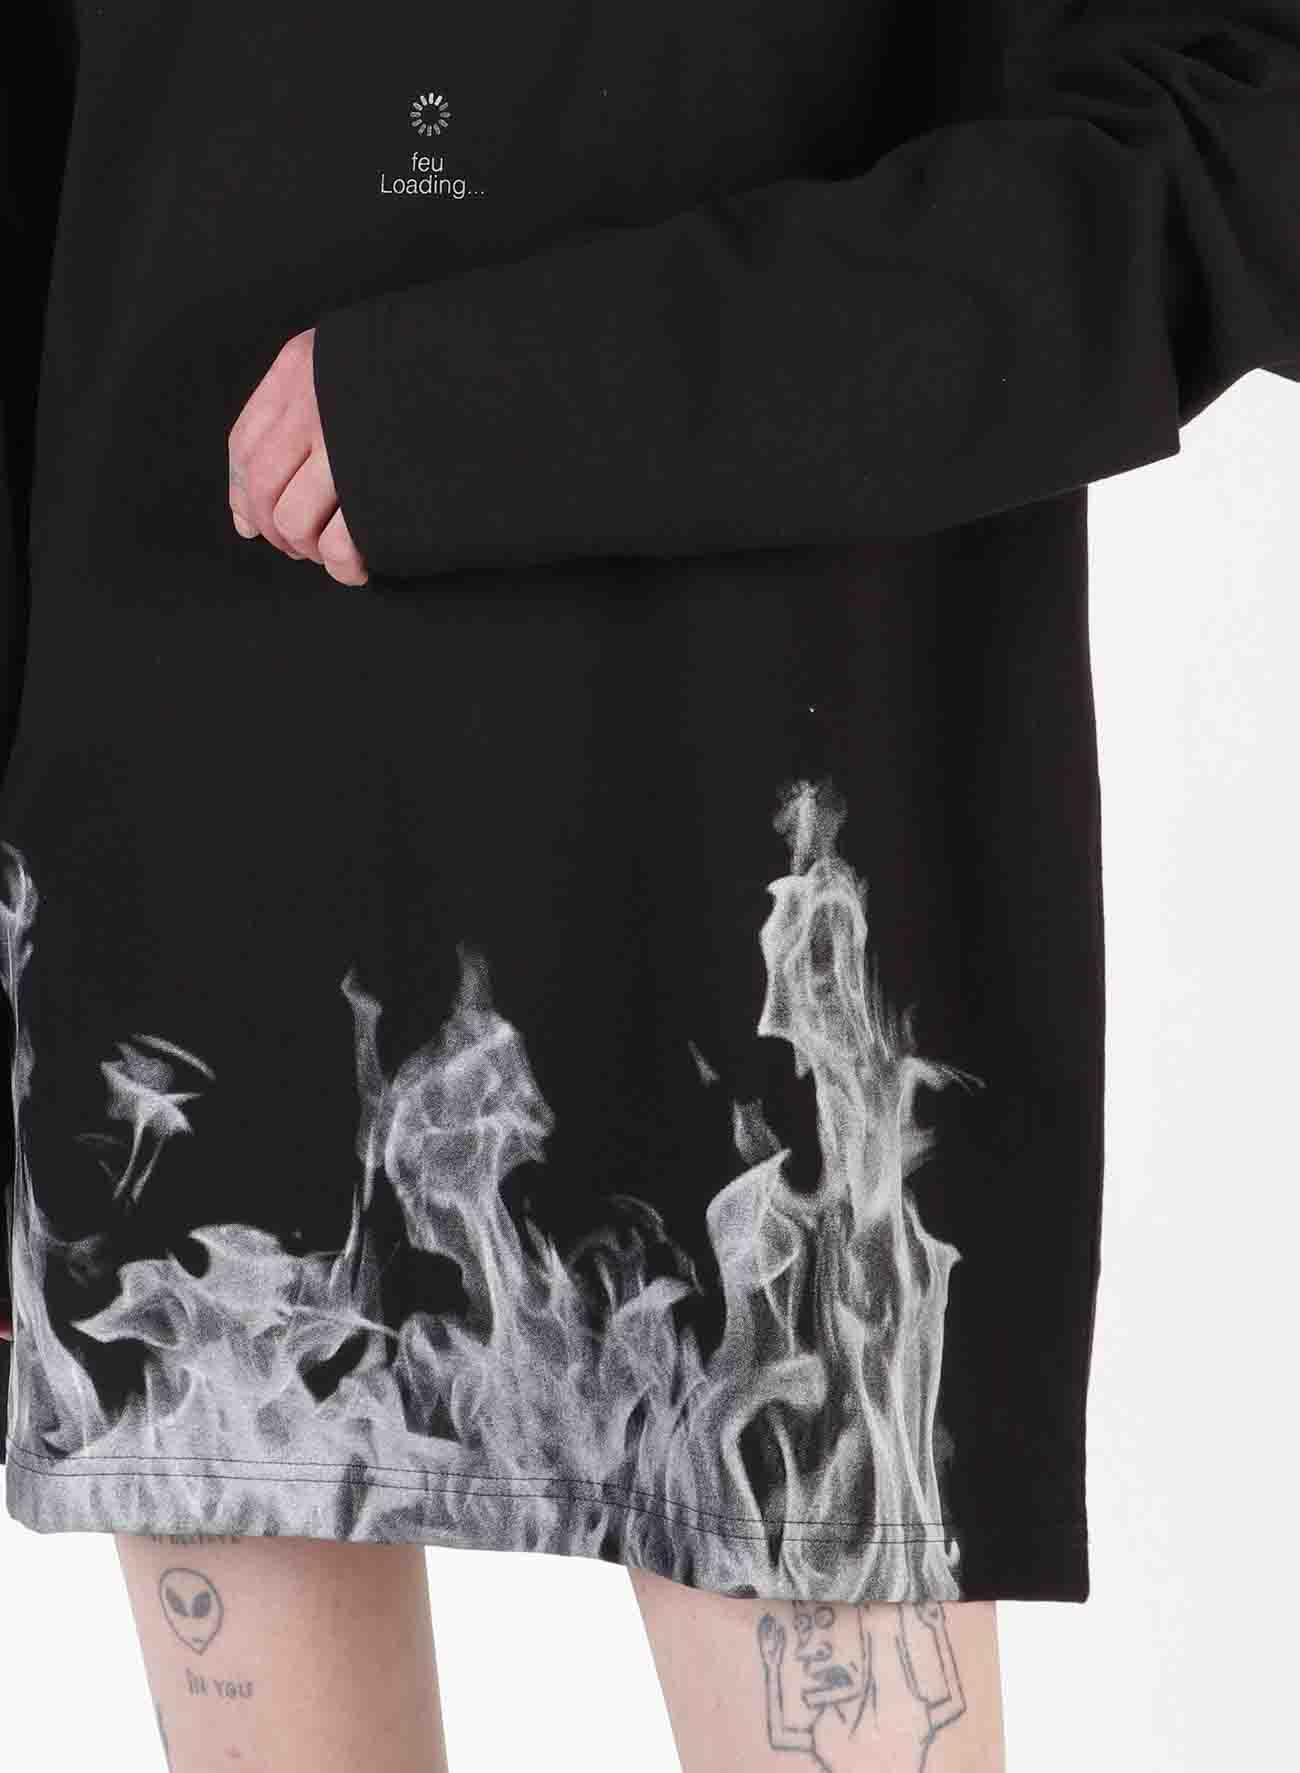 feu Loading Print Oversized Long T-Shirt